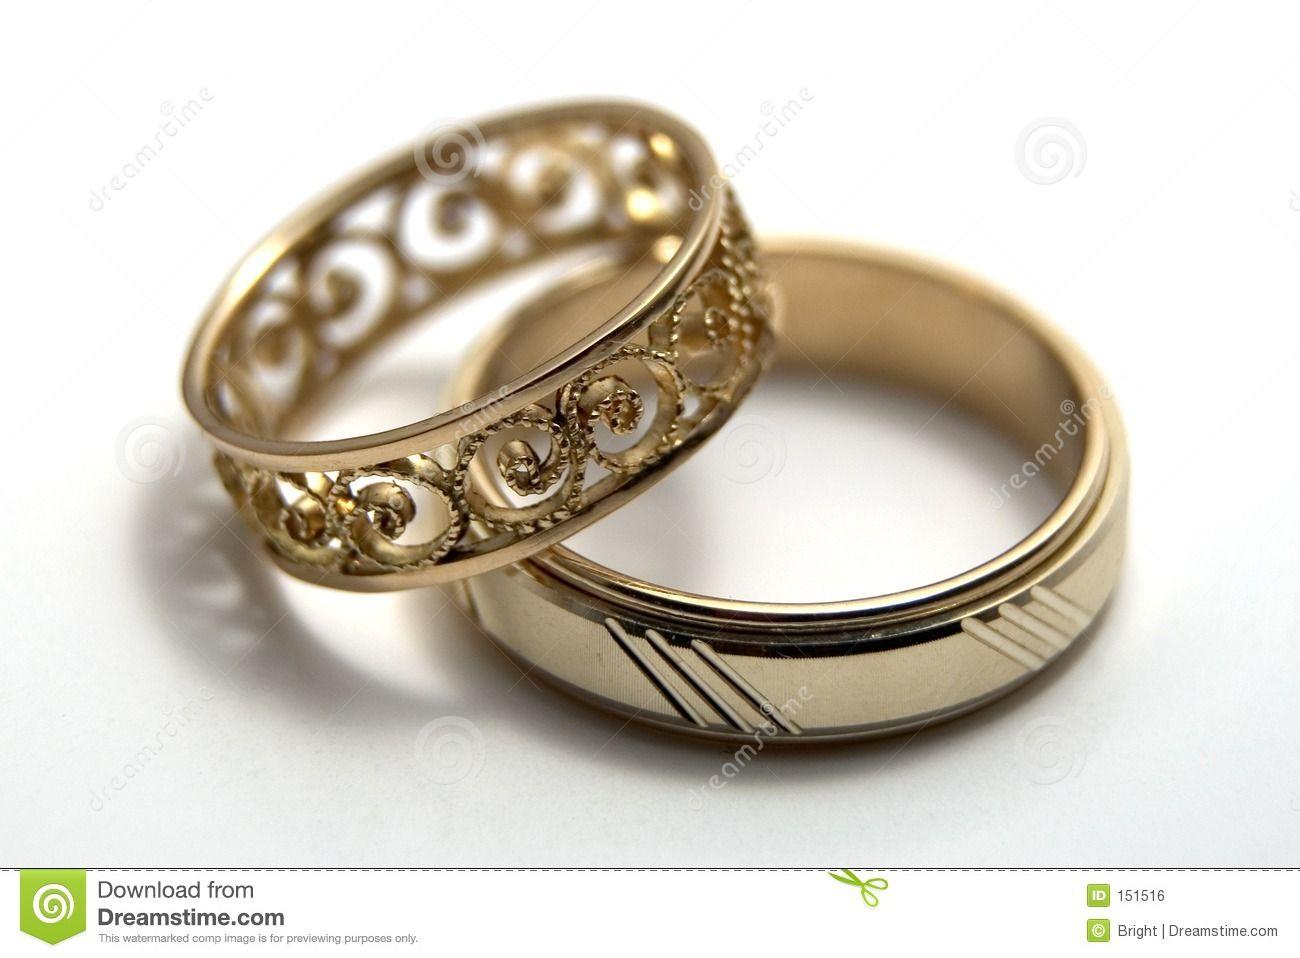 Wedding Rings Wedding Ring Pictures Heirloom Wedding Rings Wedding Rings